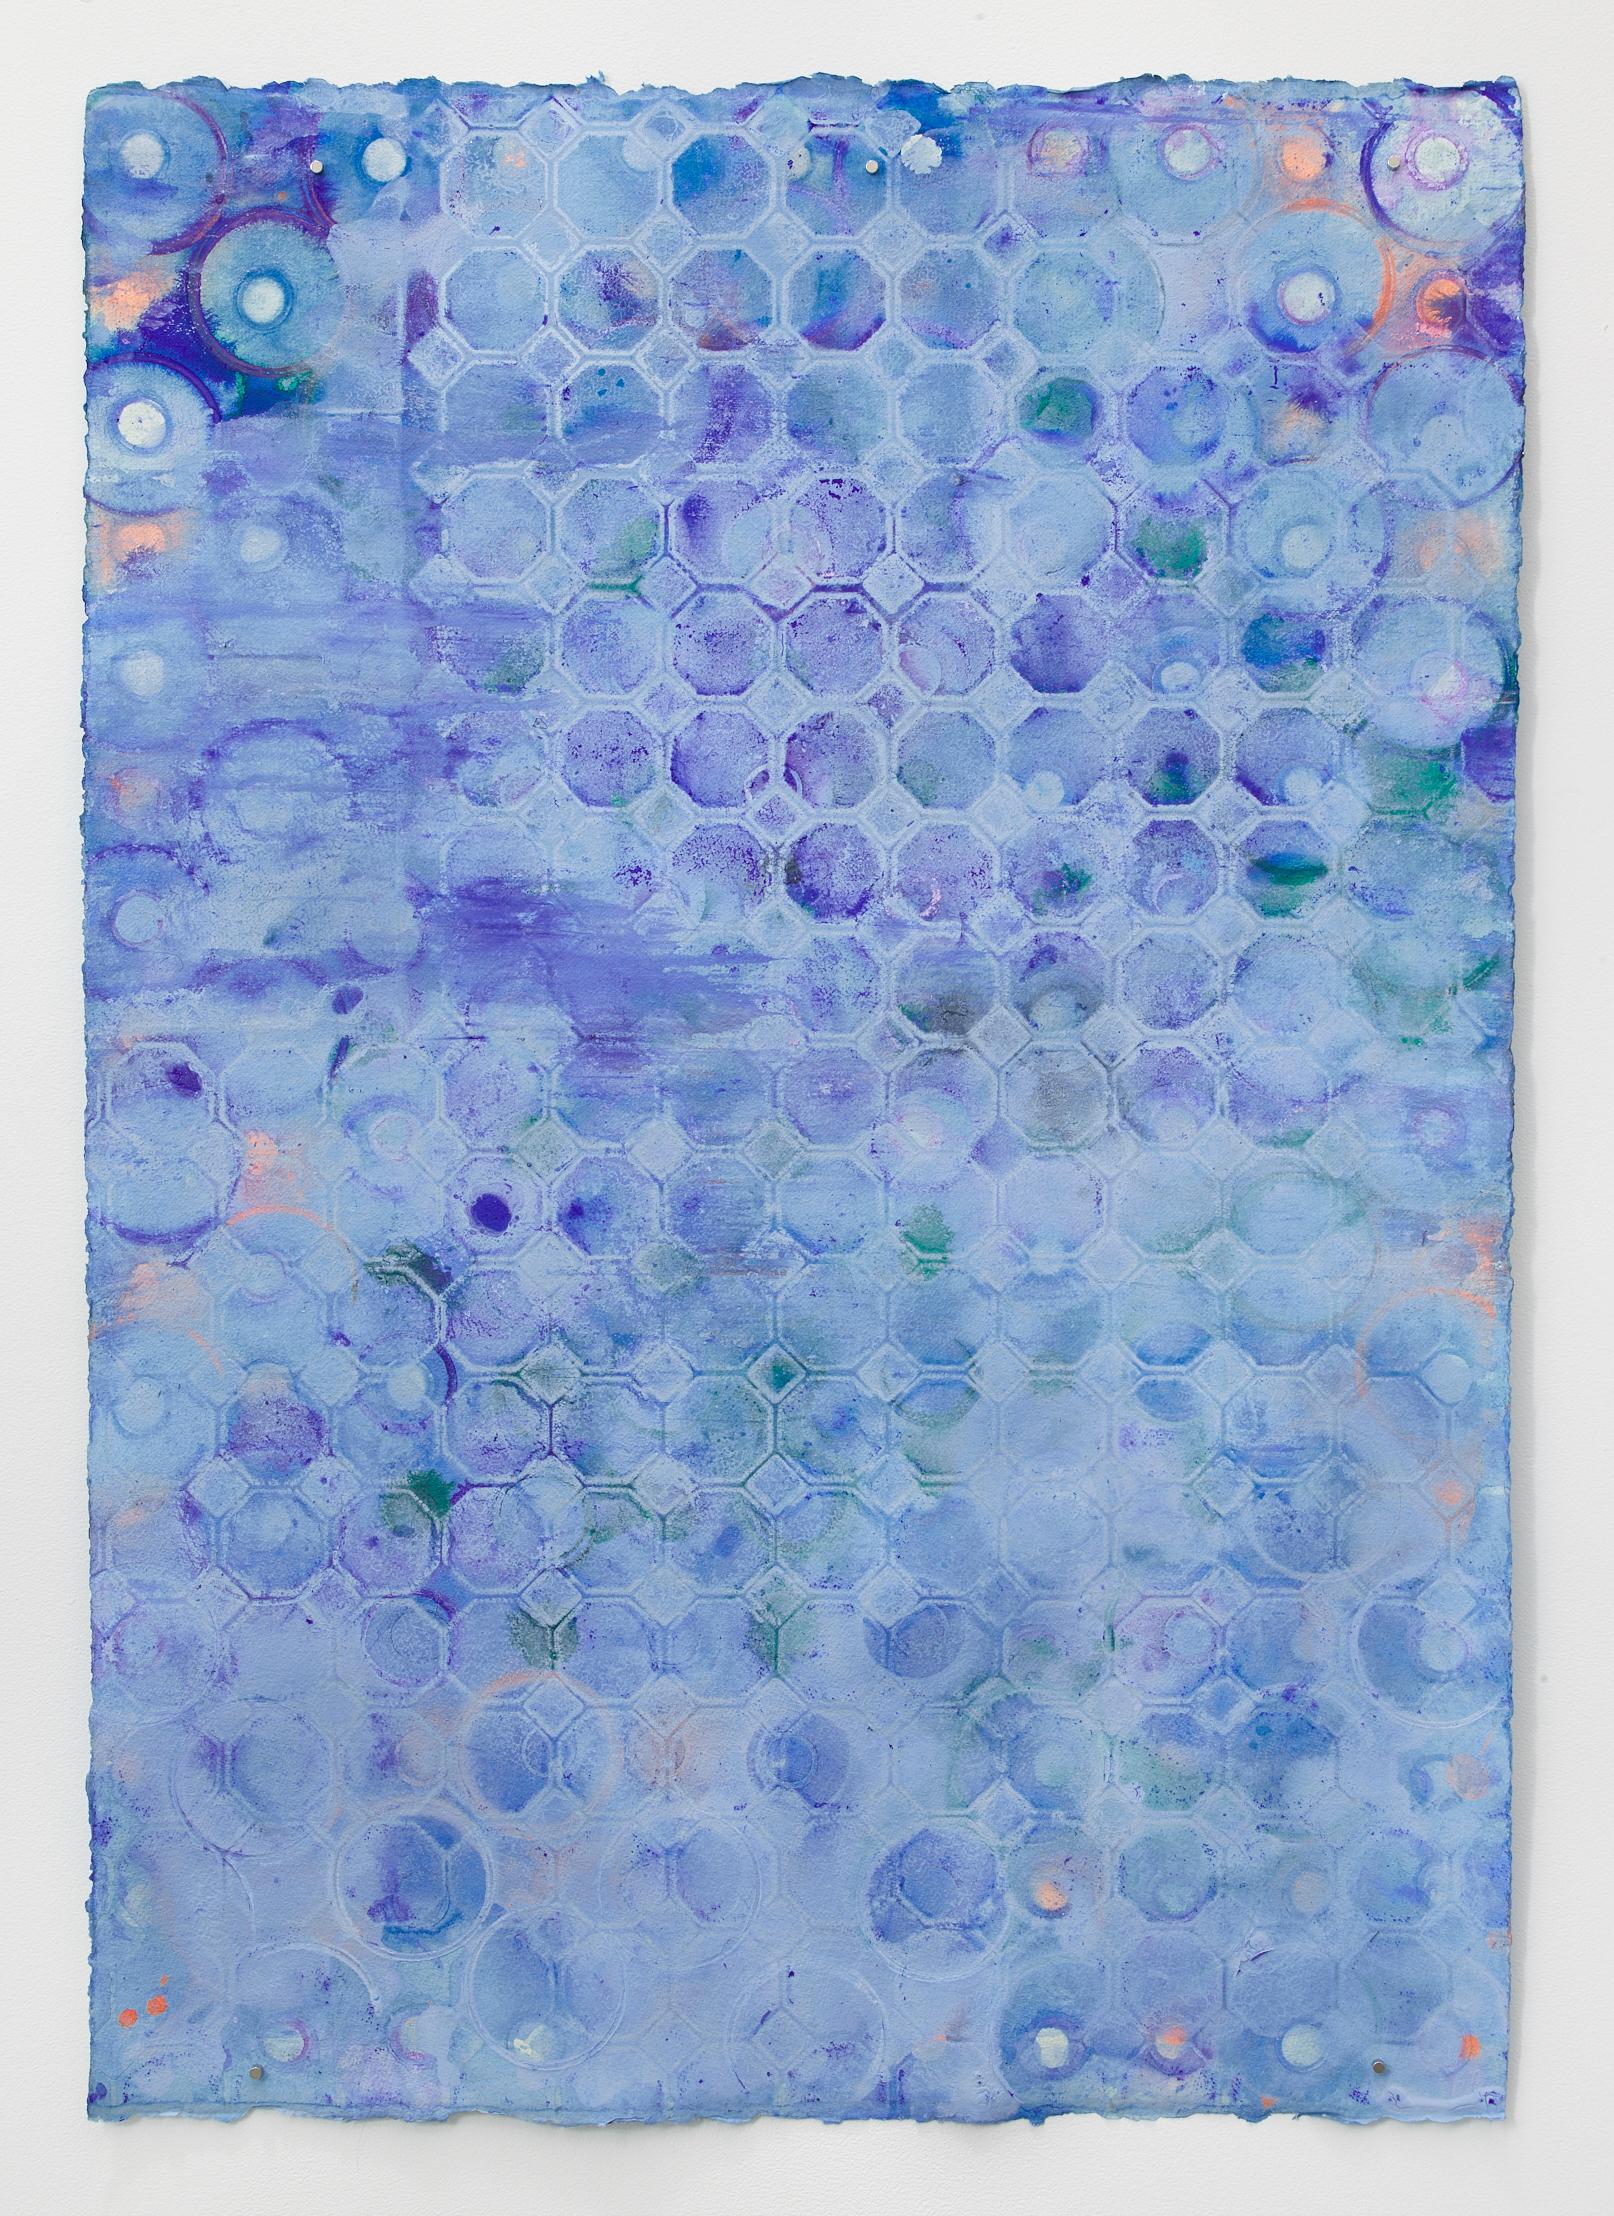 Ellen Hackl Fagan, Seeking the Sound of Cobalt Blue_Blue Glaze, 2018, Minimalist